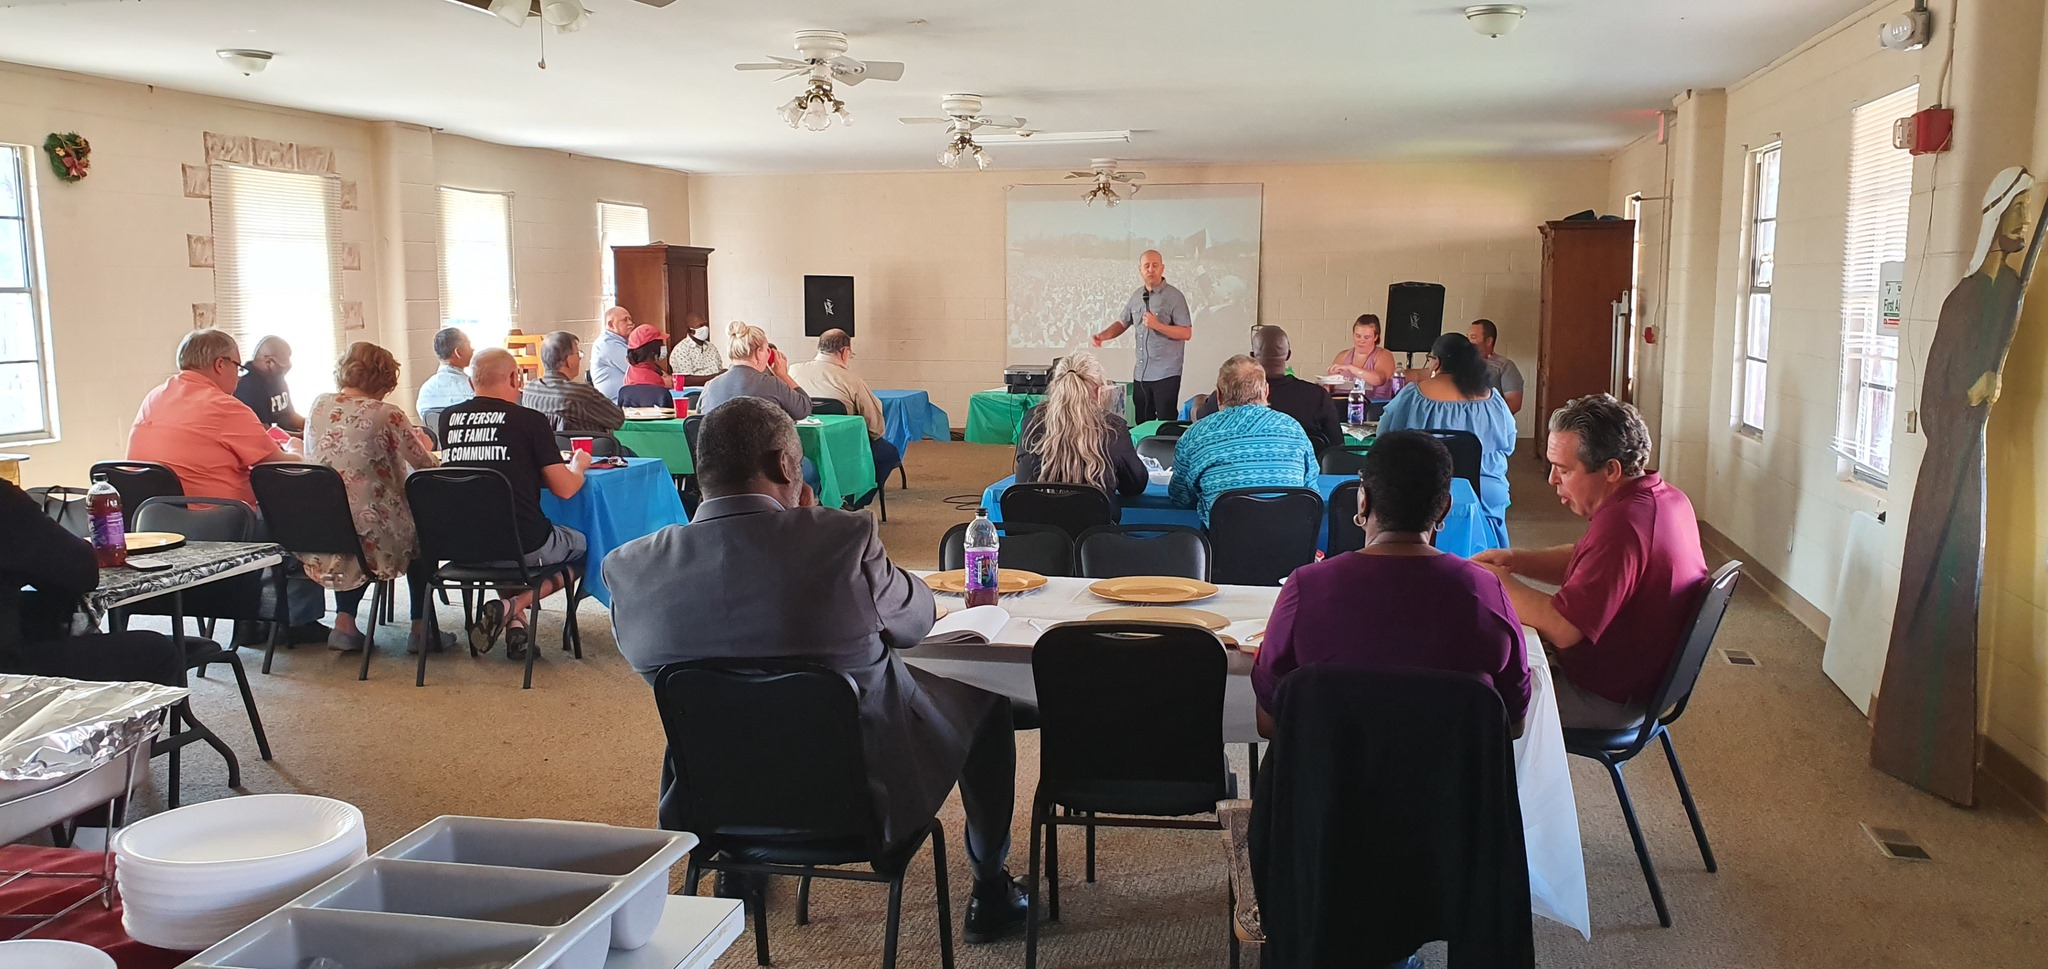 Training pastors in Tulsa